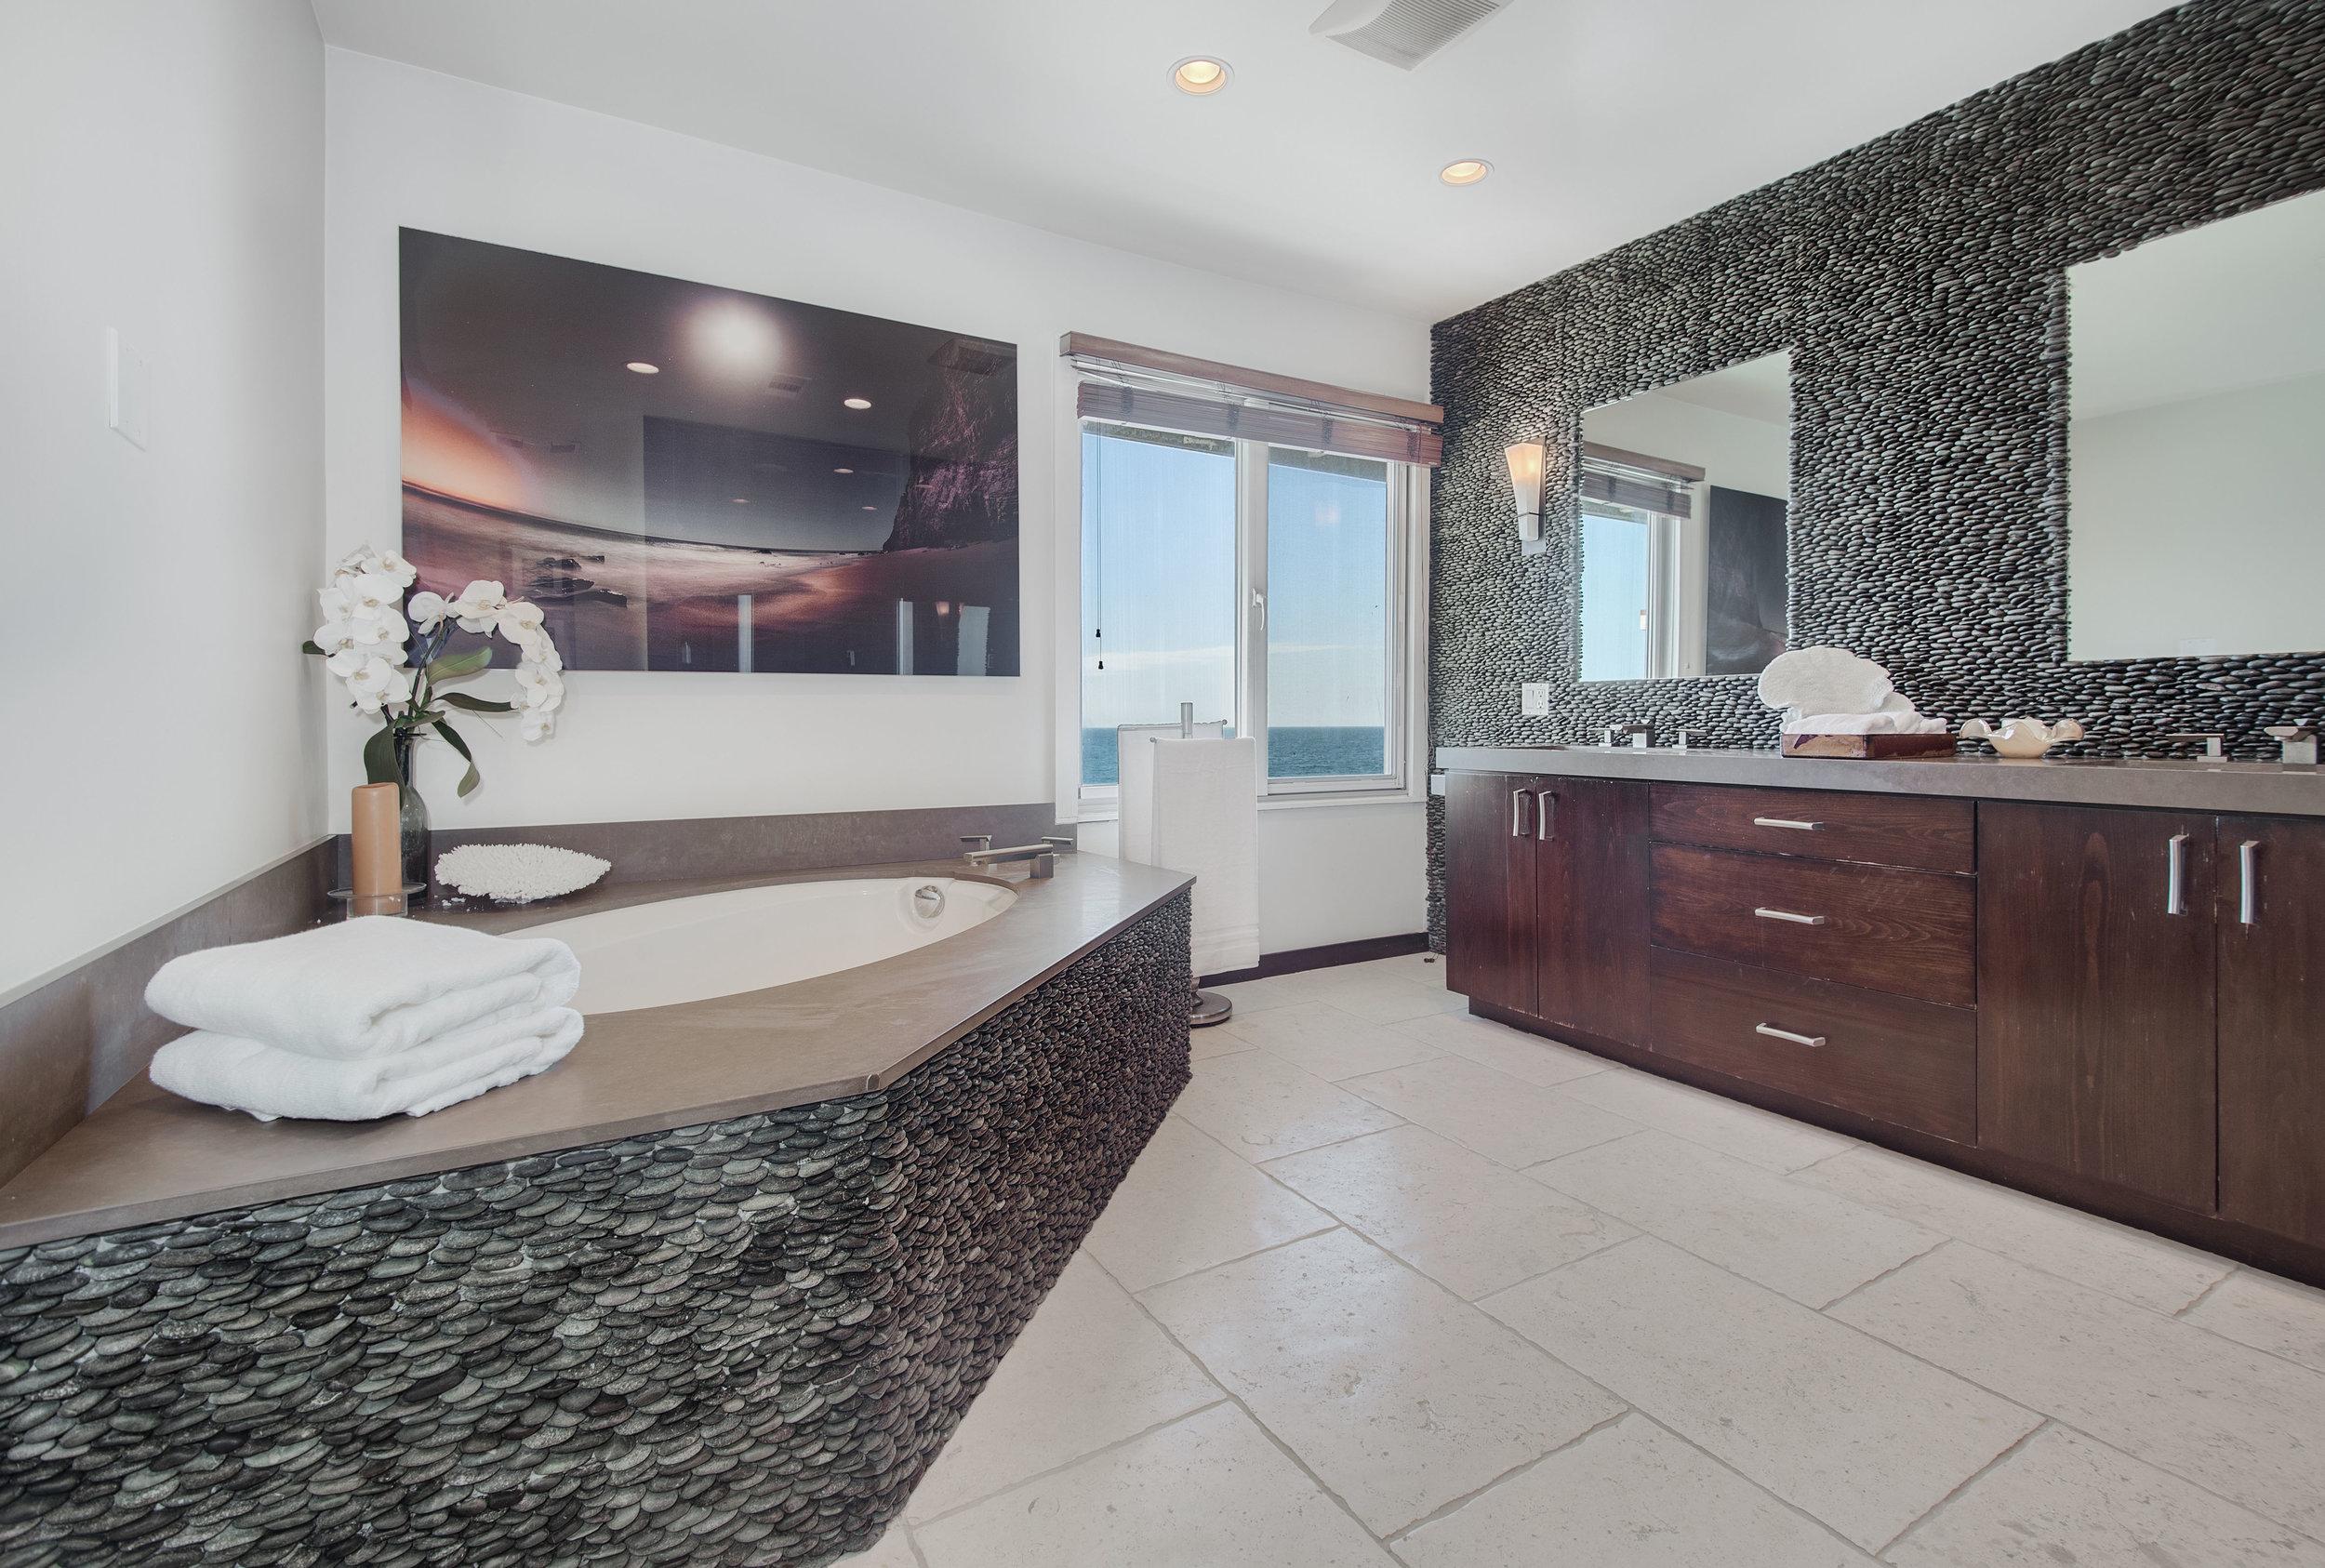 017 Master Bathroom 25342 Malibu Road For Sale Lease The Malibu Life Team Luxury Real Estate.jpg